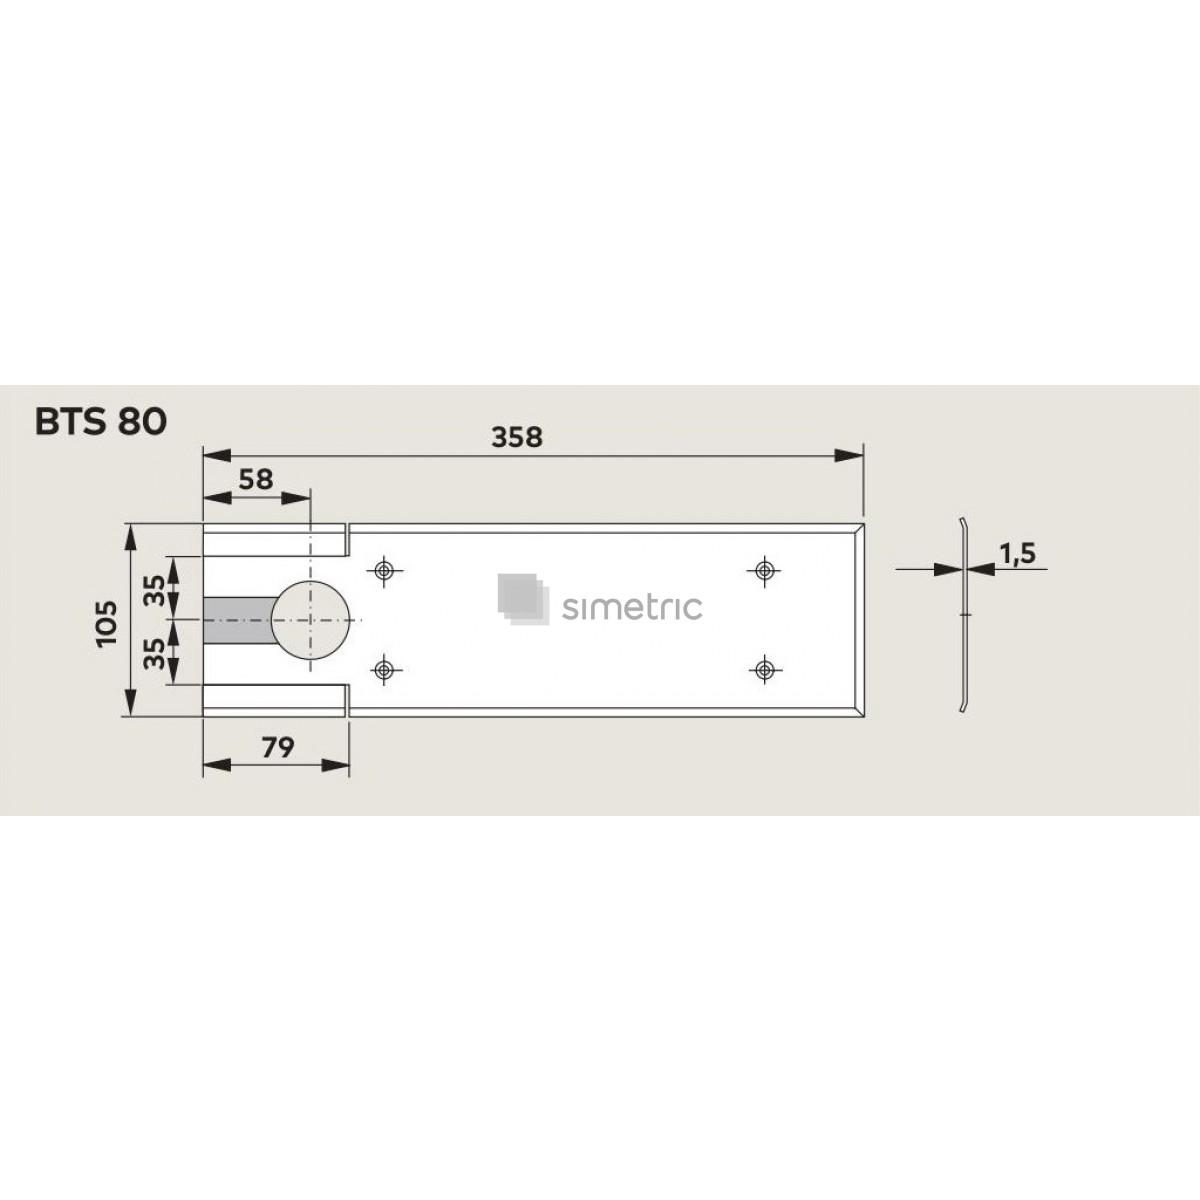 Capac amortizor de pardoseala Dorma BTS 80, finisaj INOX - 46700000